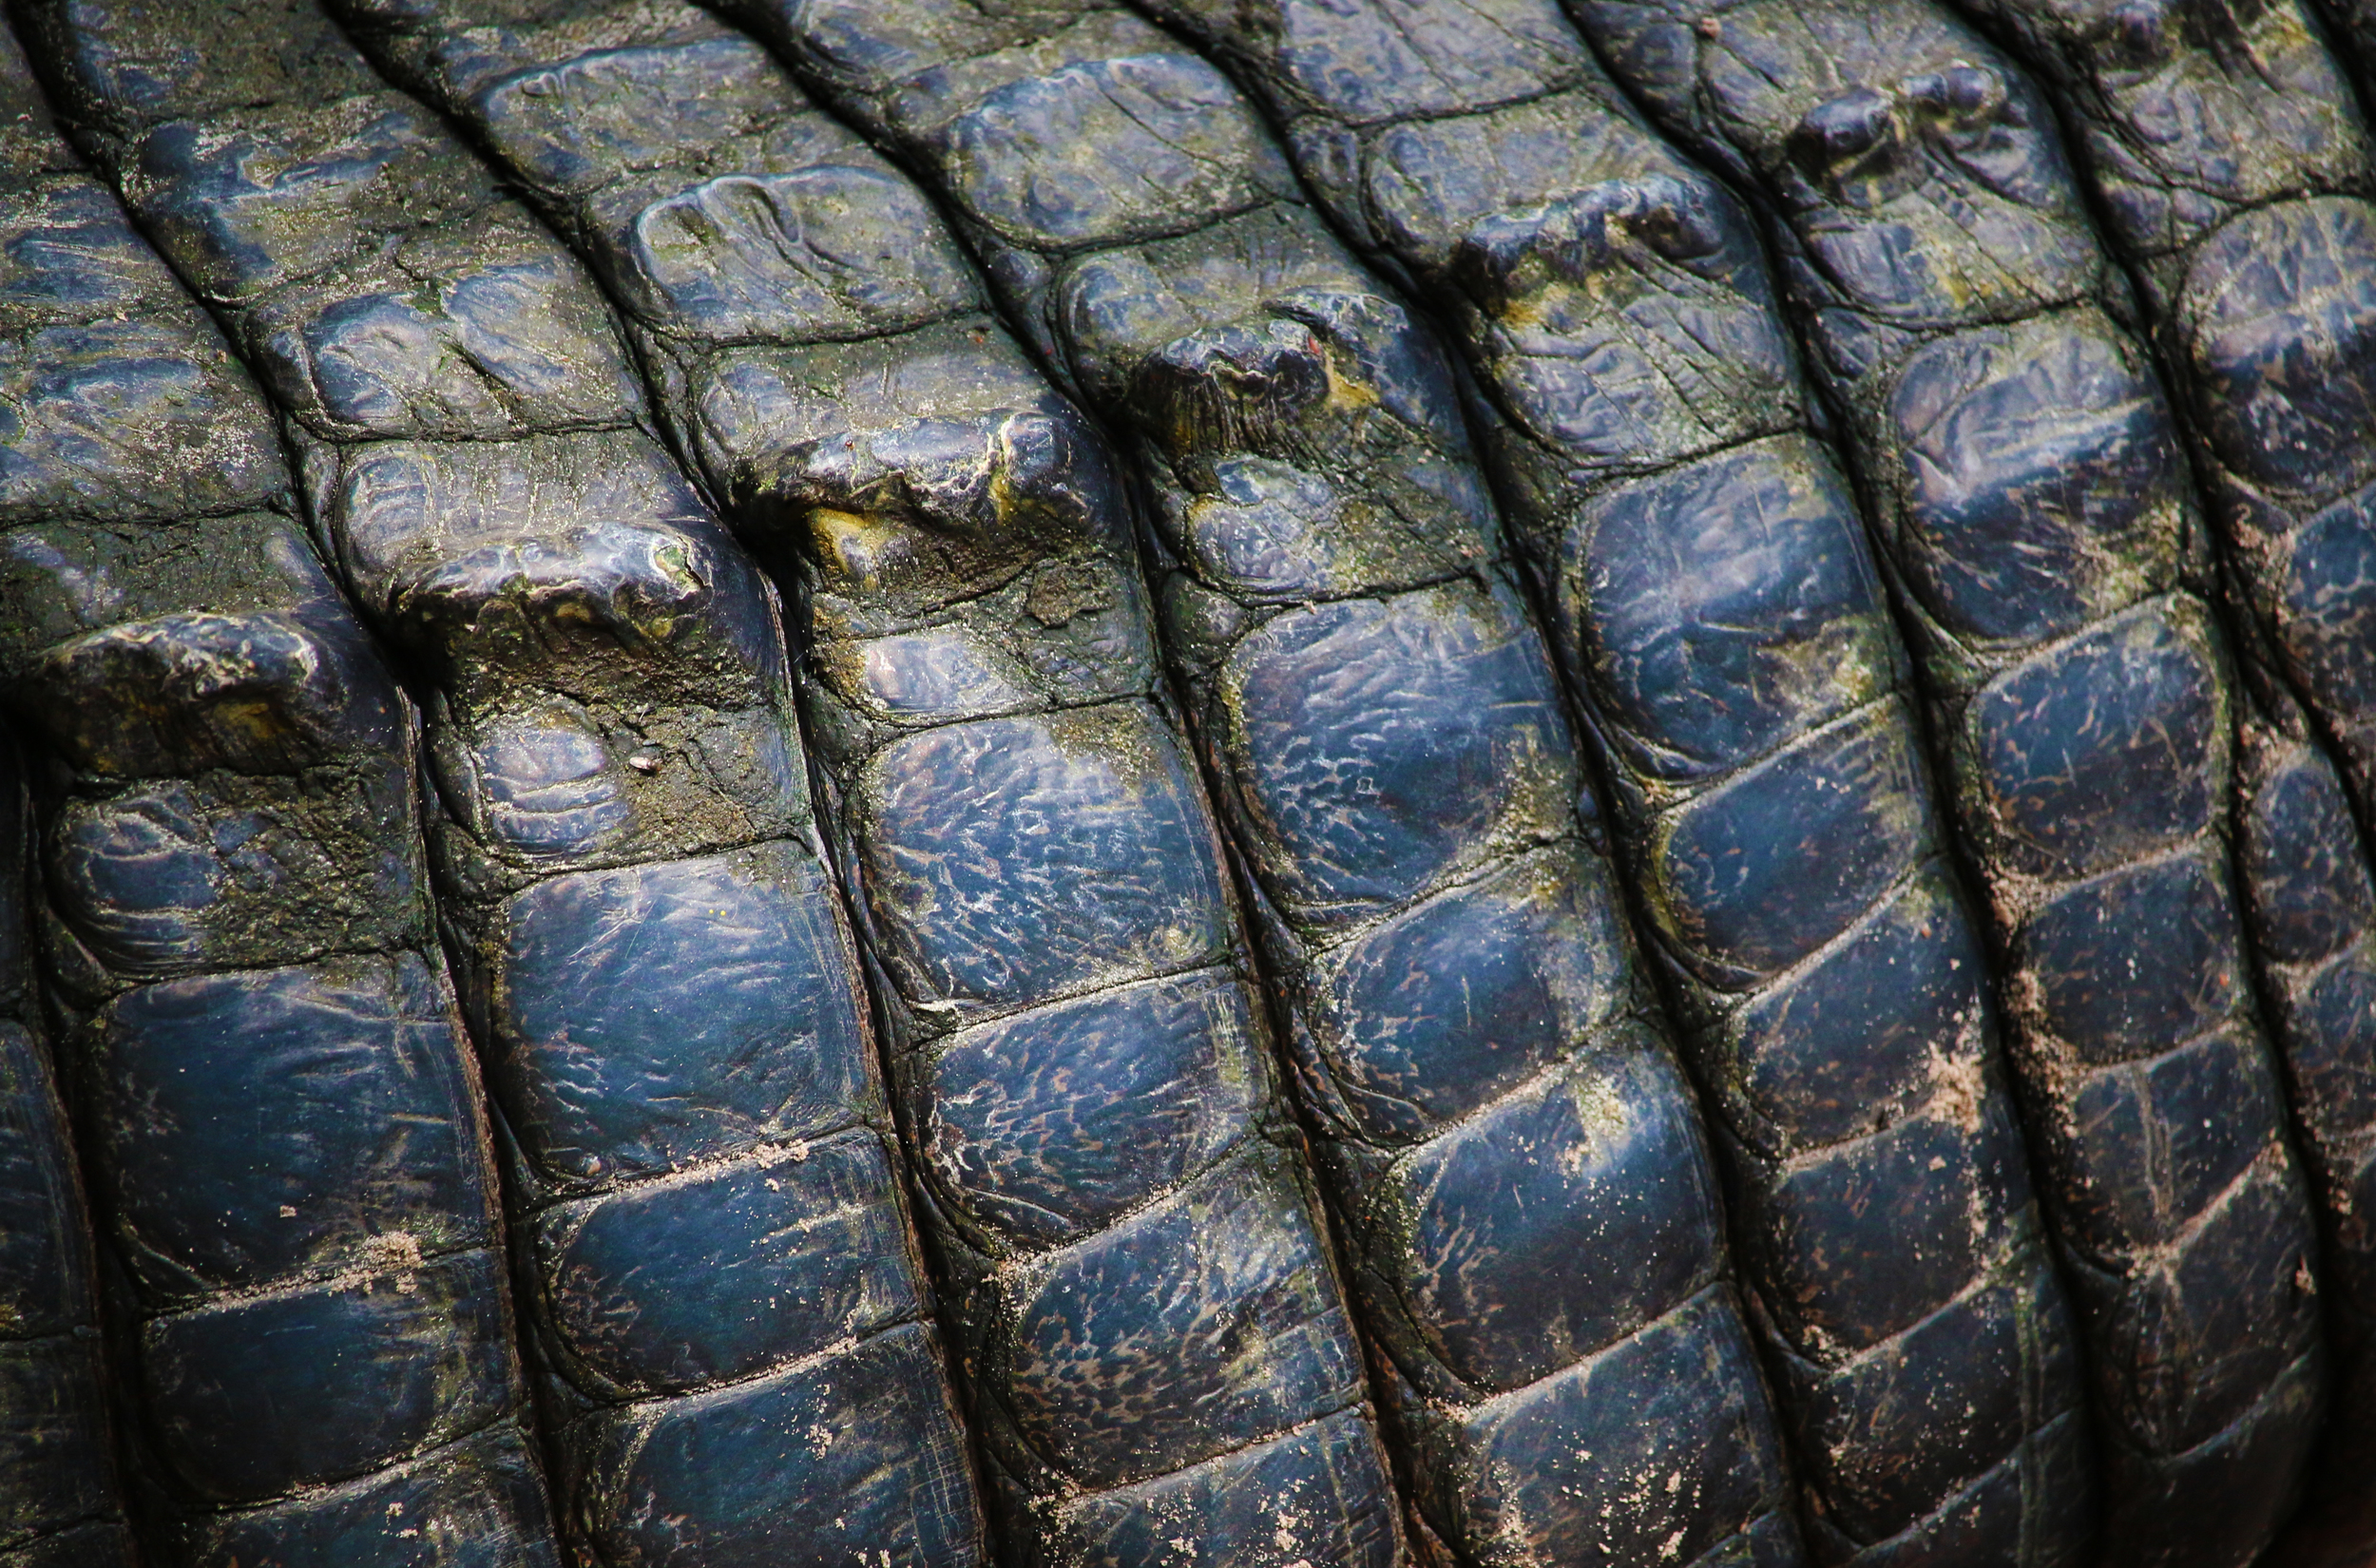 Close up of Alligator Scales